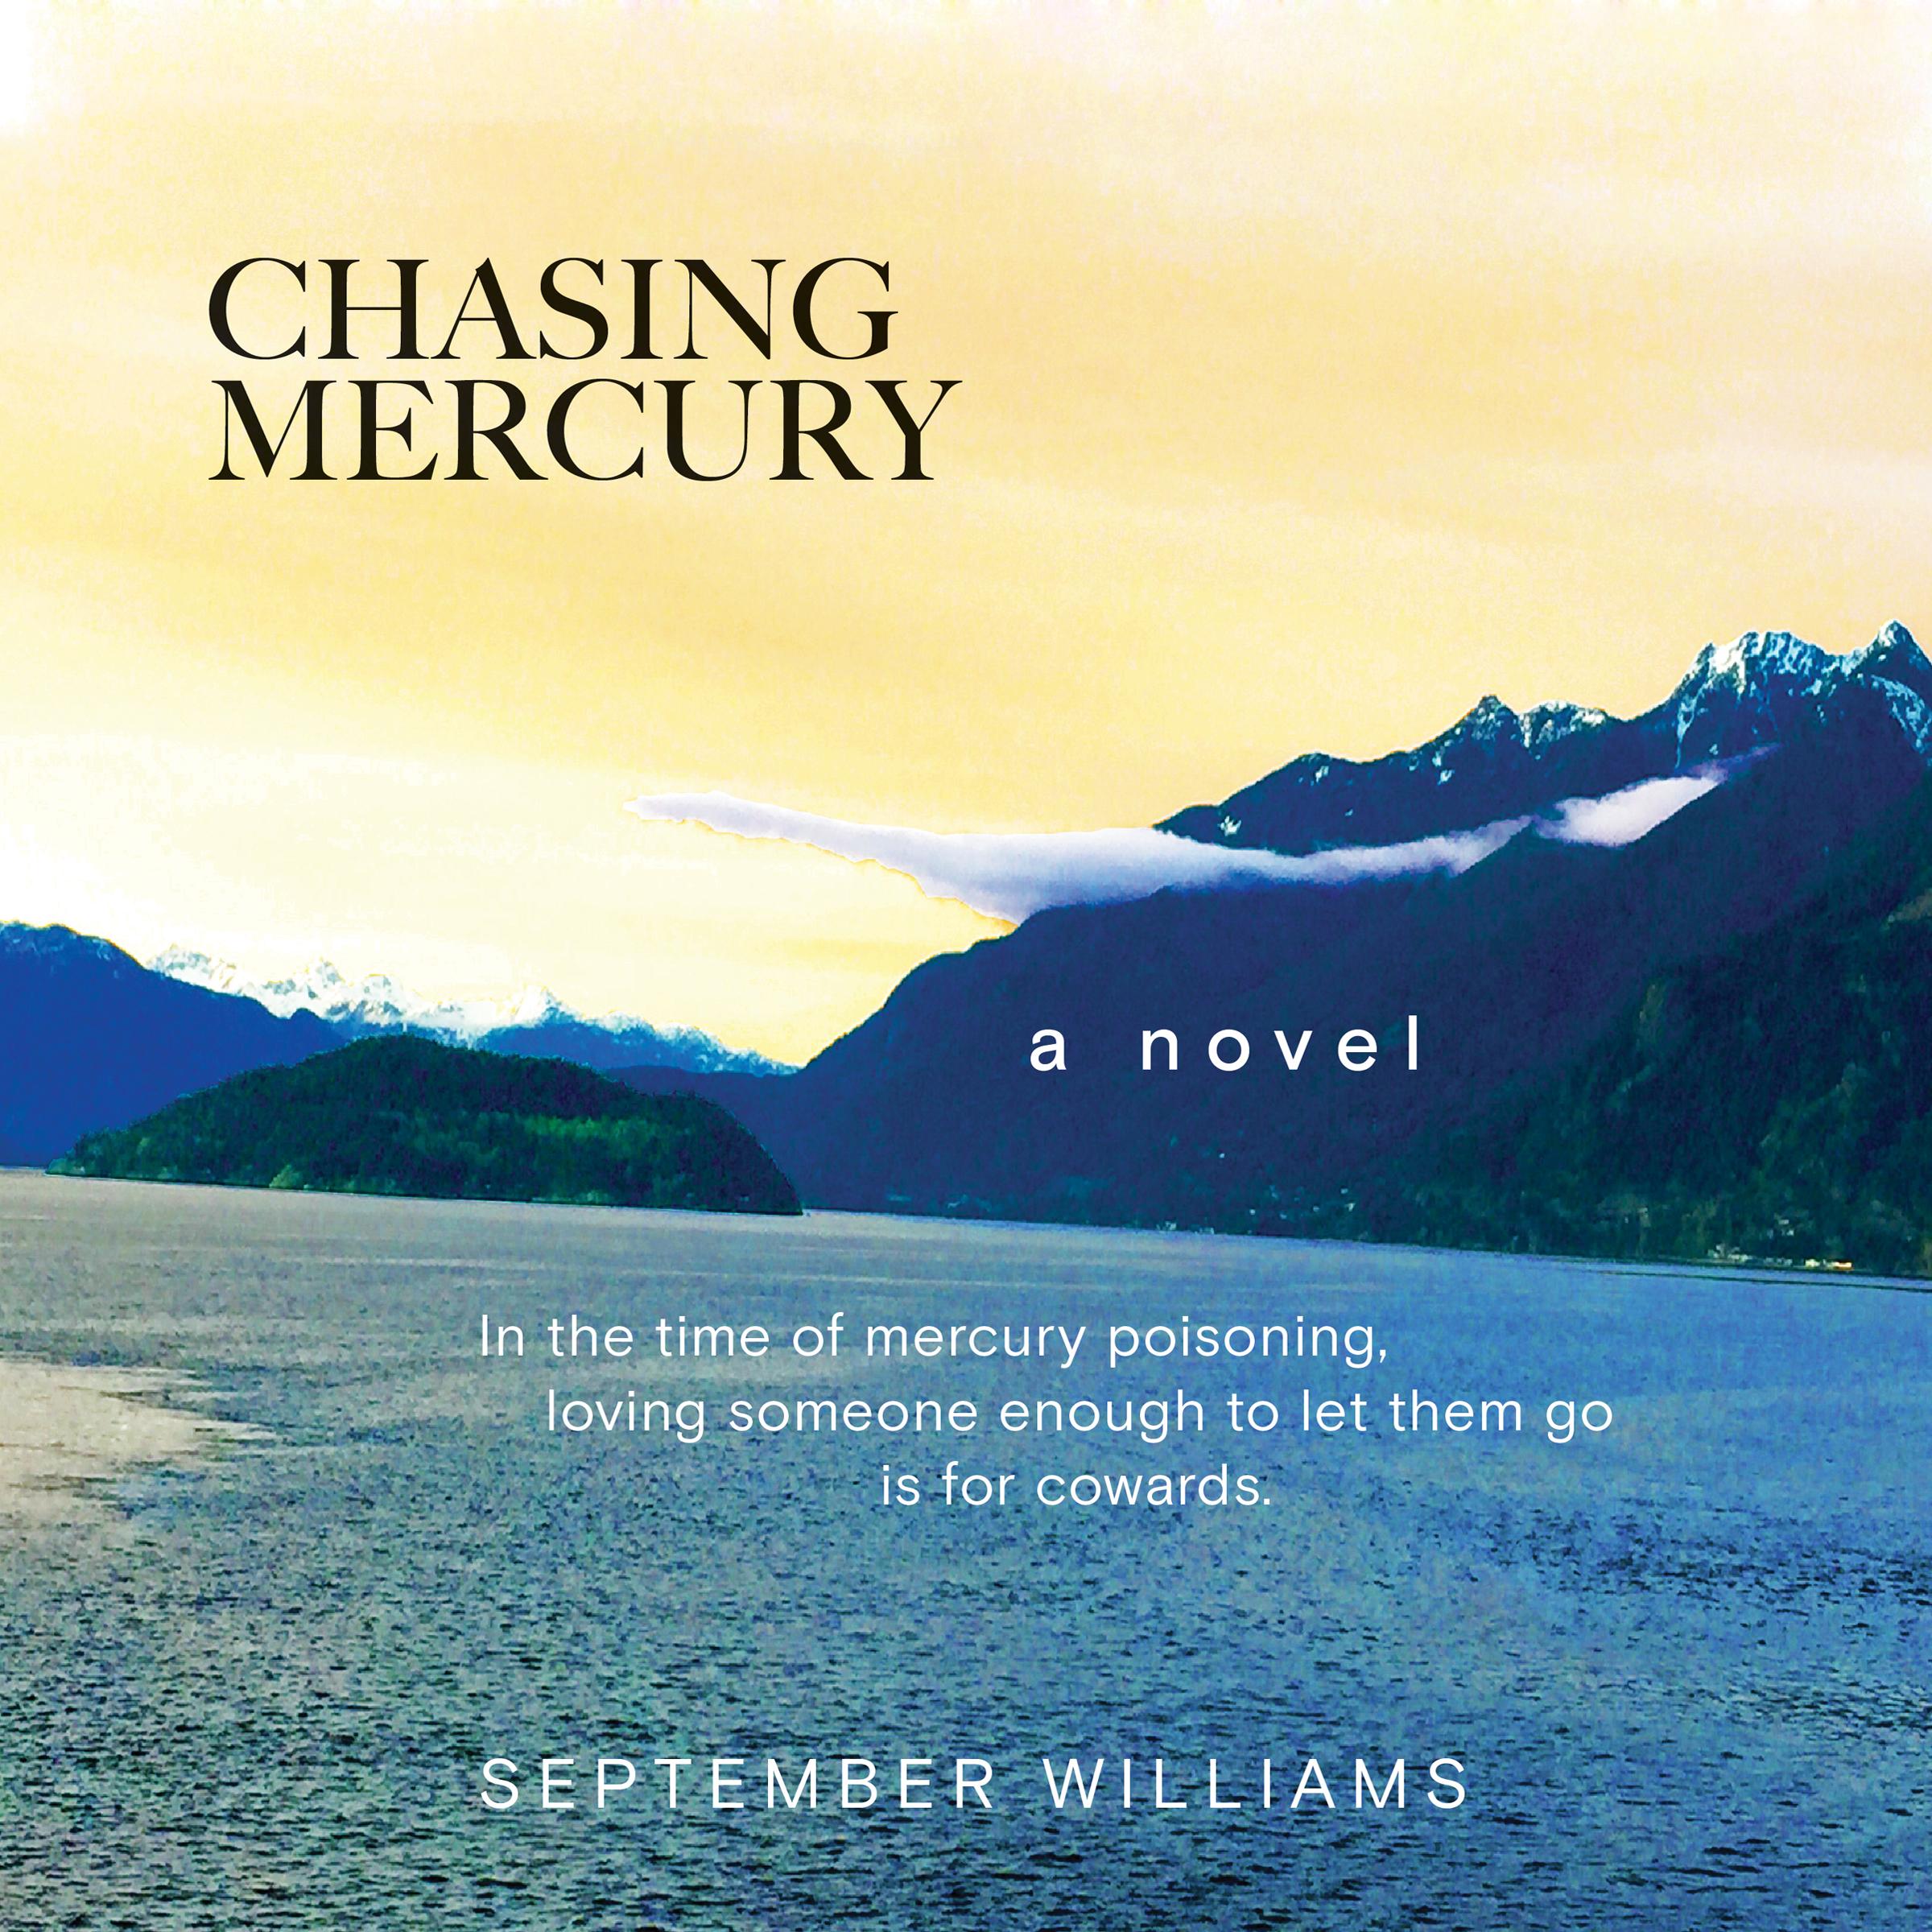 CHASING MERCURY_AUDIOBOOK_COVER-01.jpg